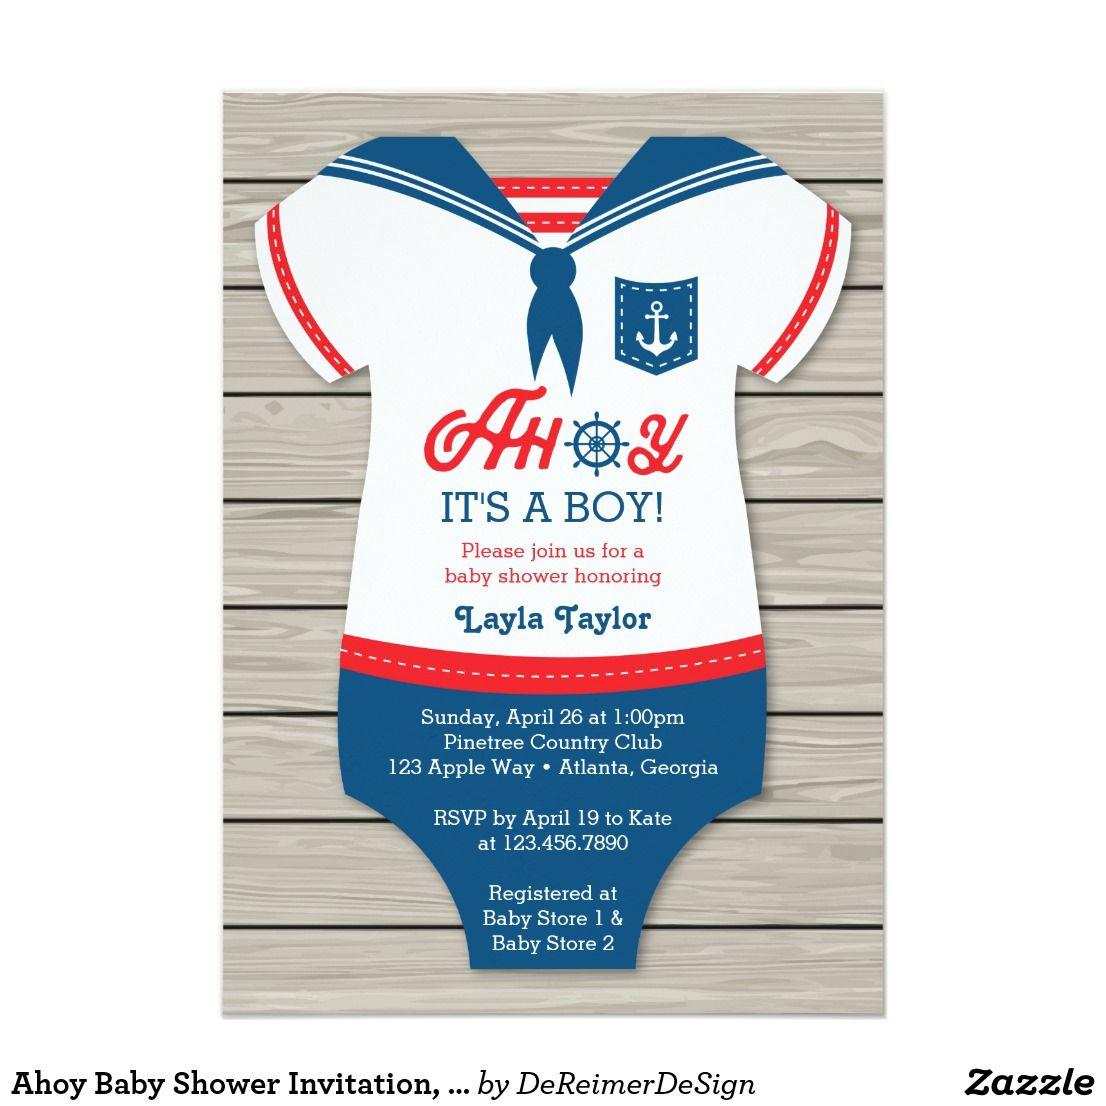 Ahoy Baby Shower Invitation, Sailor, Nautical Invitation | Shower ...